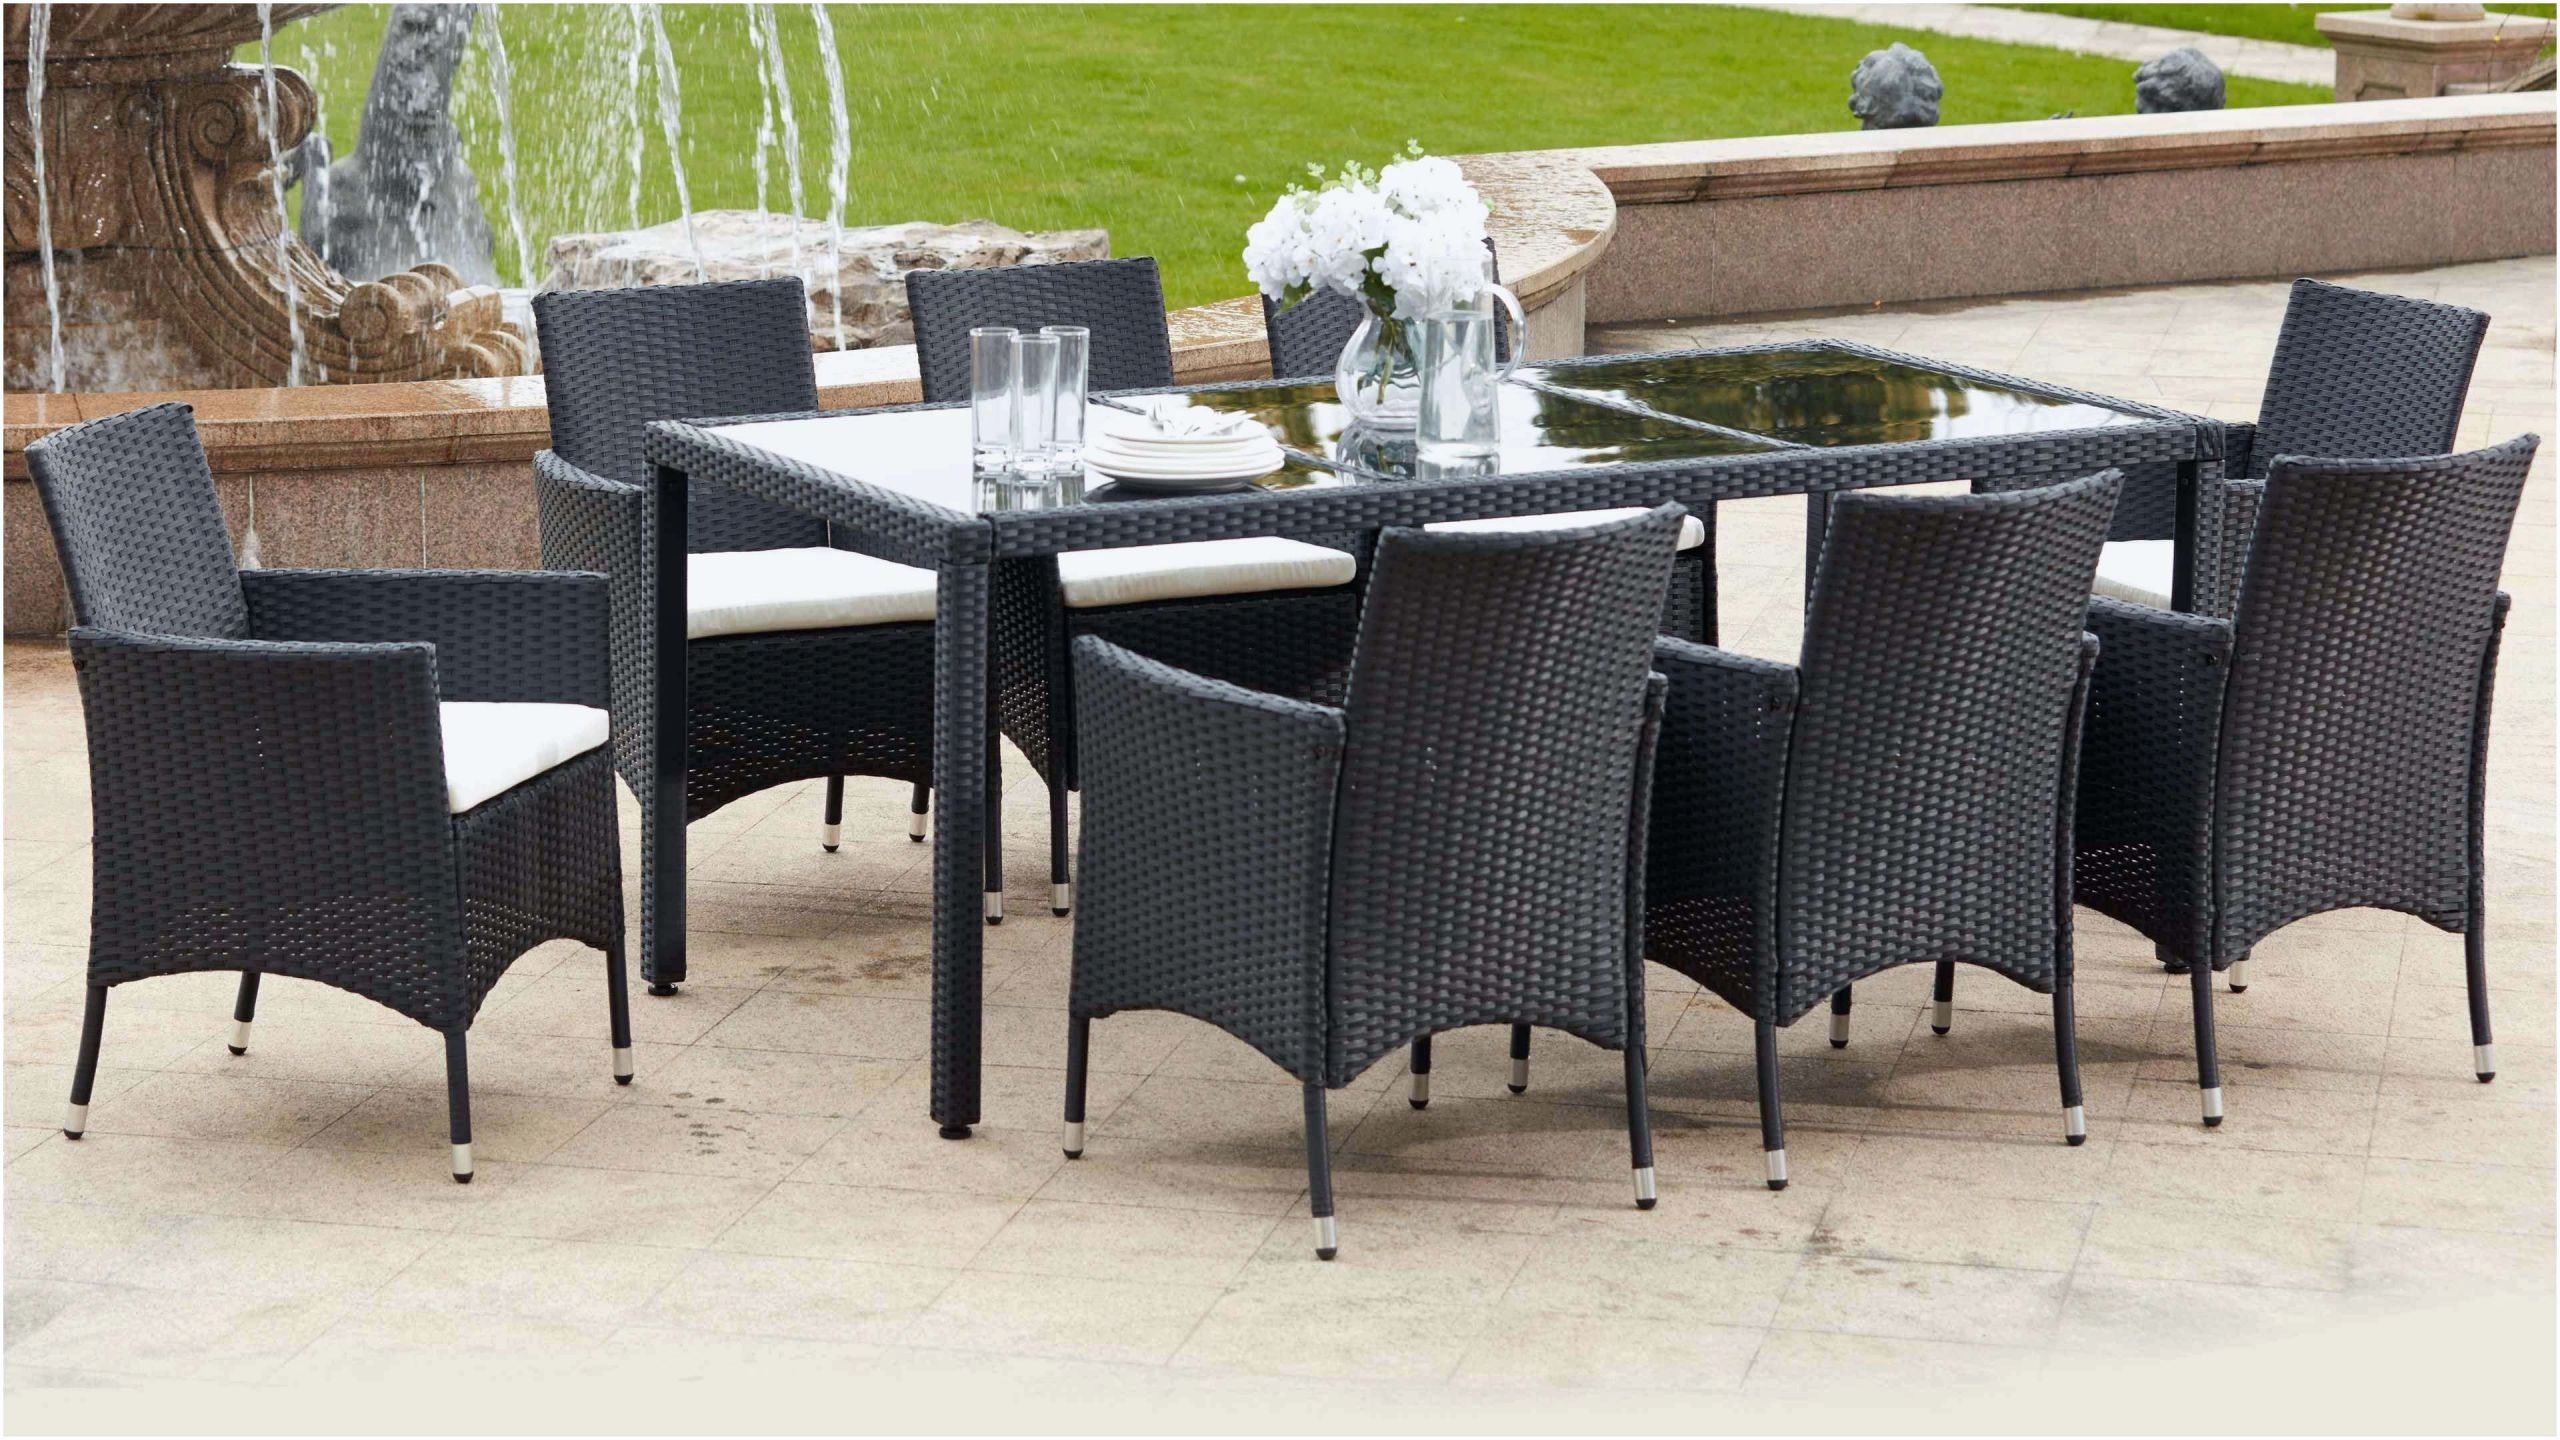 petite table i source dinspiration elegant bordure jardin i beau collection petite table de jardin of petite table i